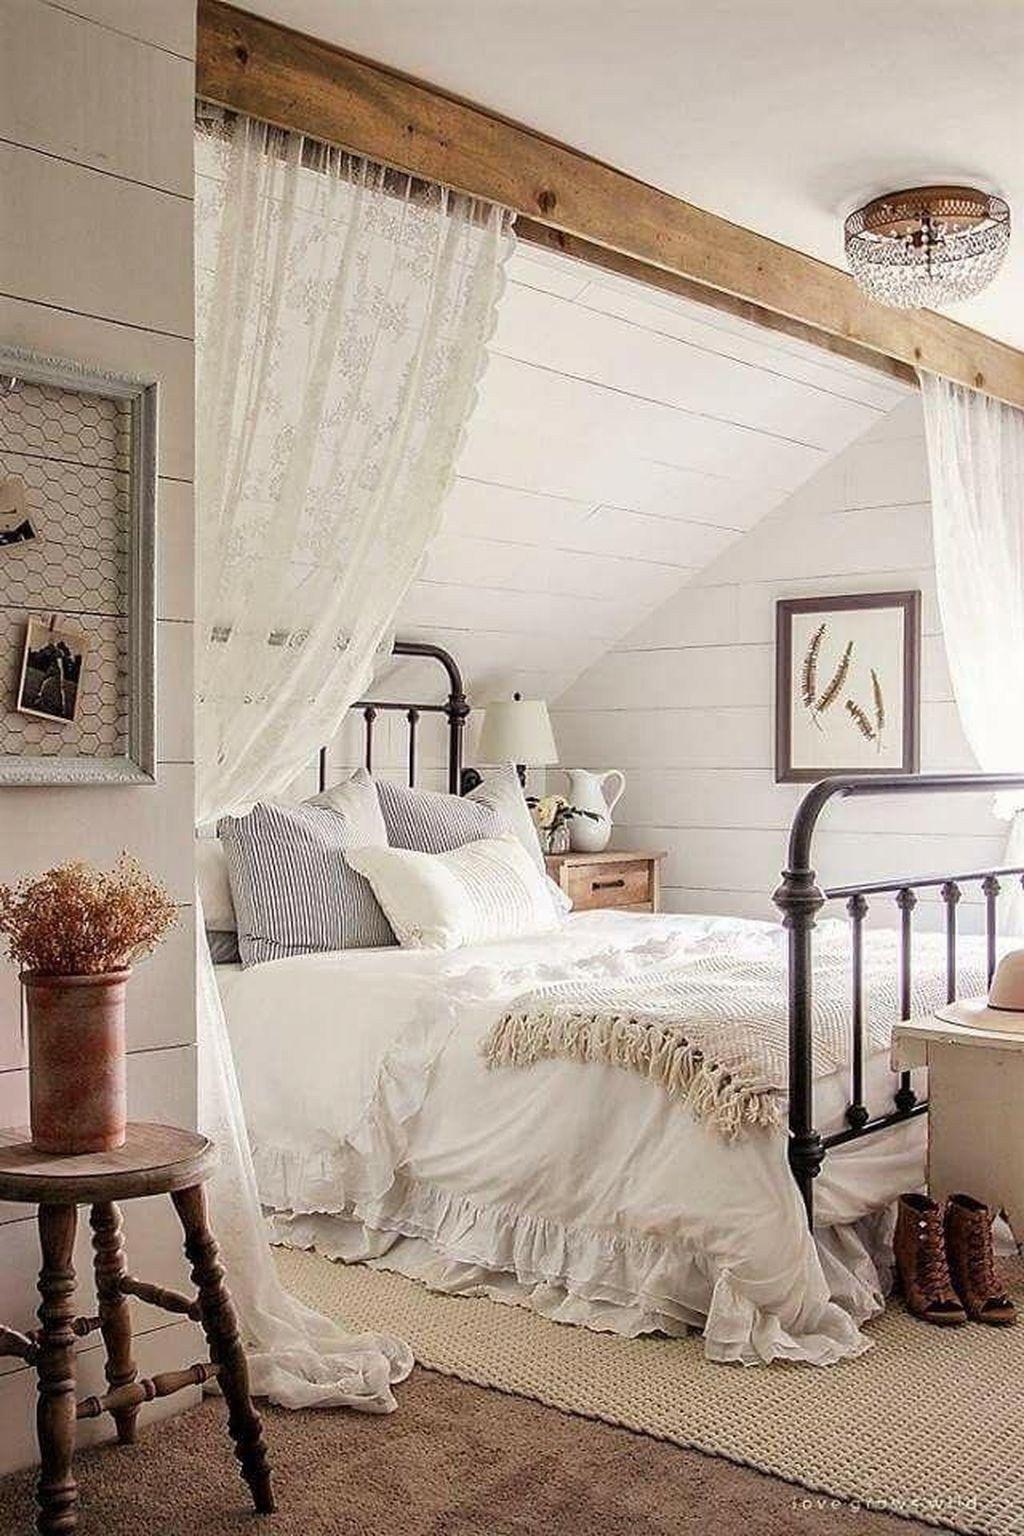 The best bedroom decor ideas with farmhouse style